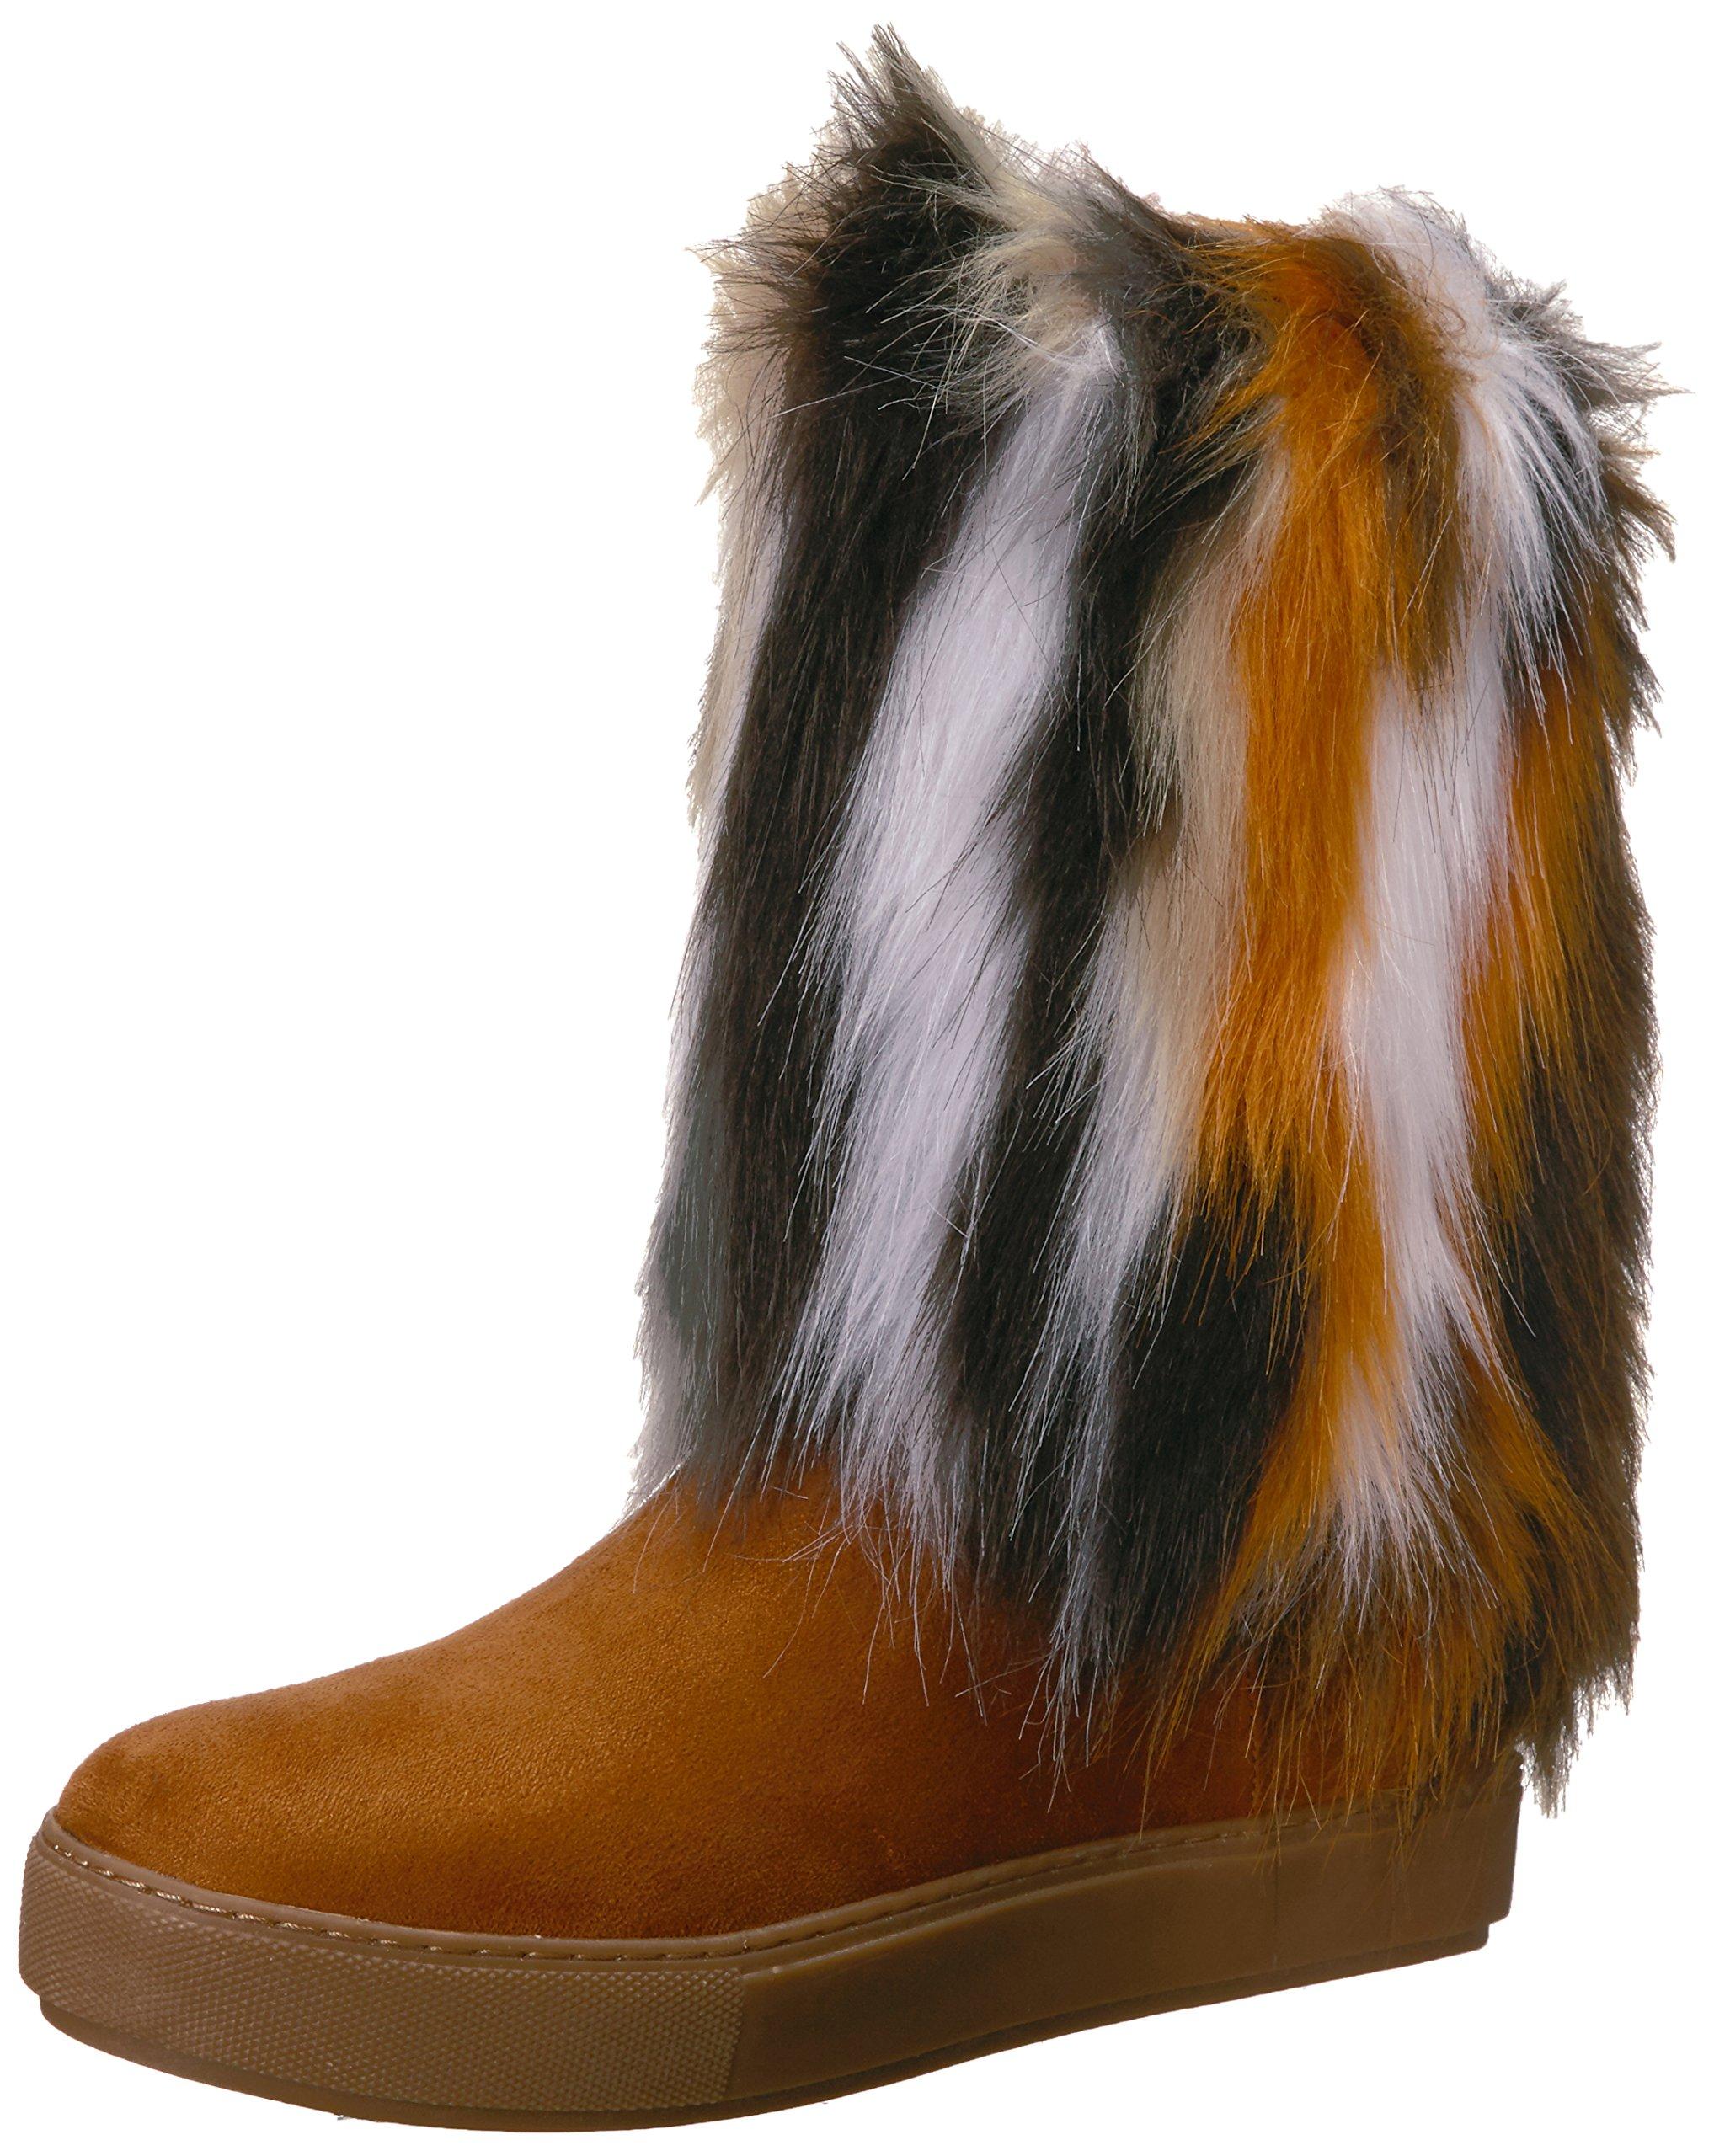 Penny Loves Kenny Women's Airbrush Winter Boot, Tan Multi, 8.5 W US